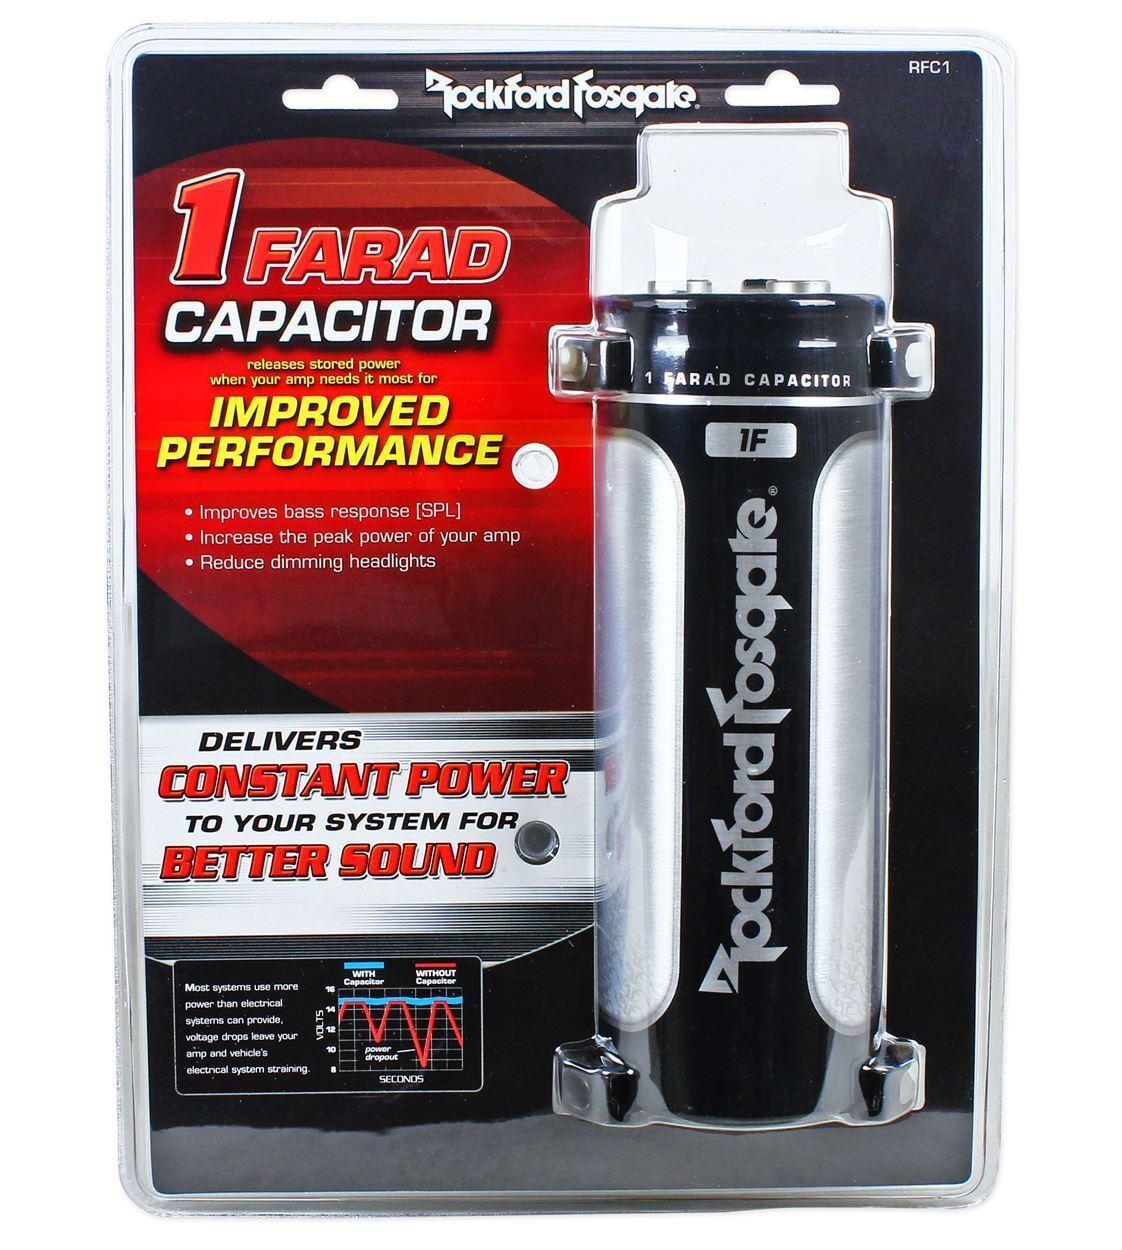 rockford fosgate capacitor wiring diagram 2005 dodge ram trailer 41